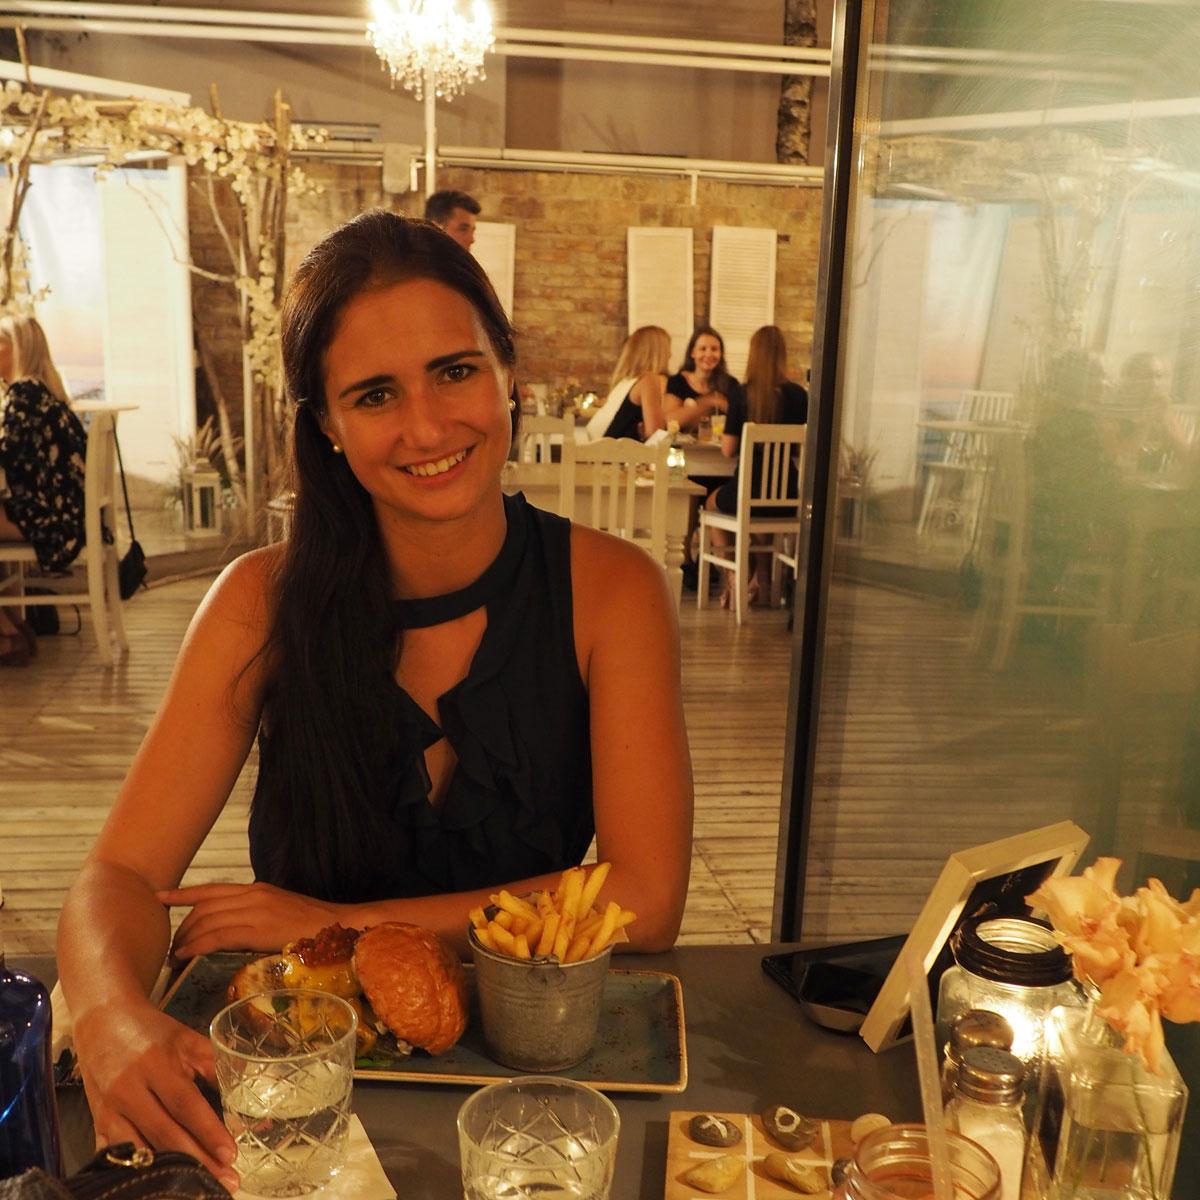 budapest-restaurants (3)